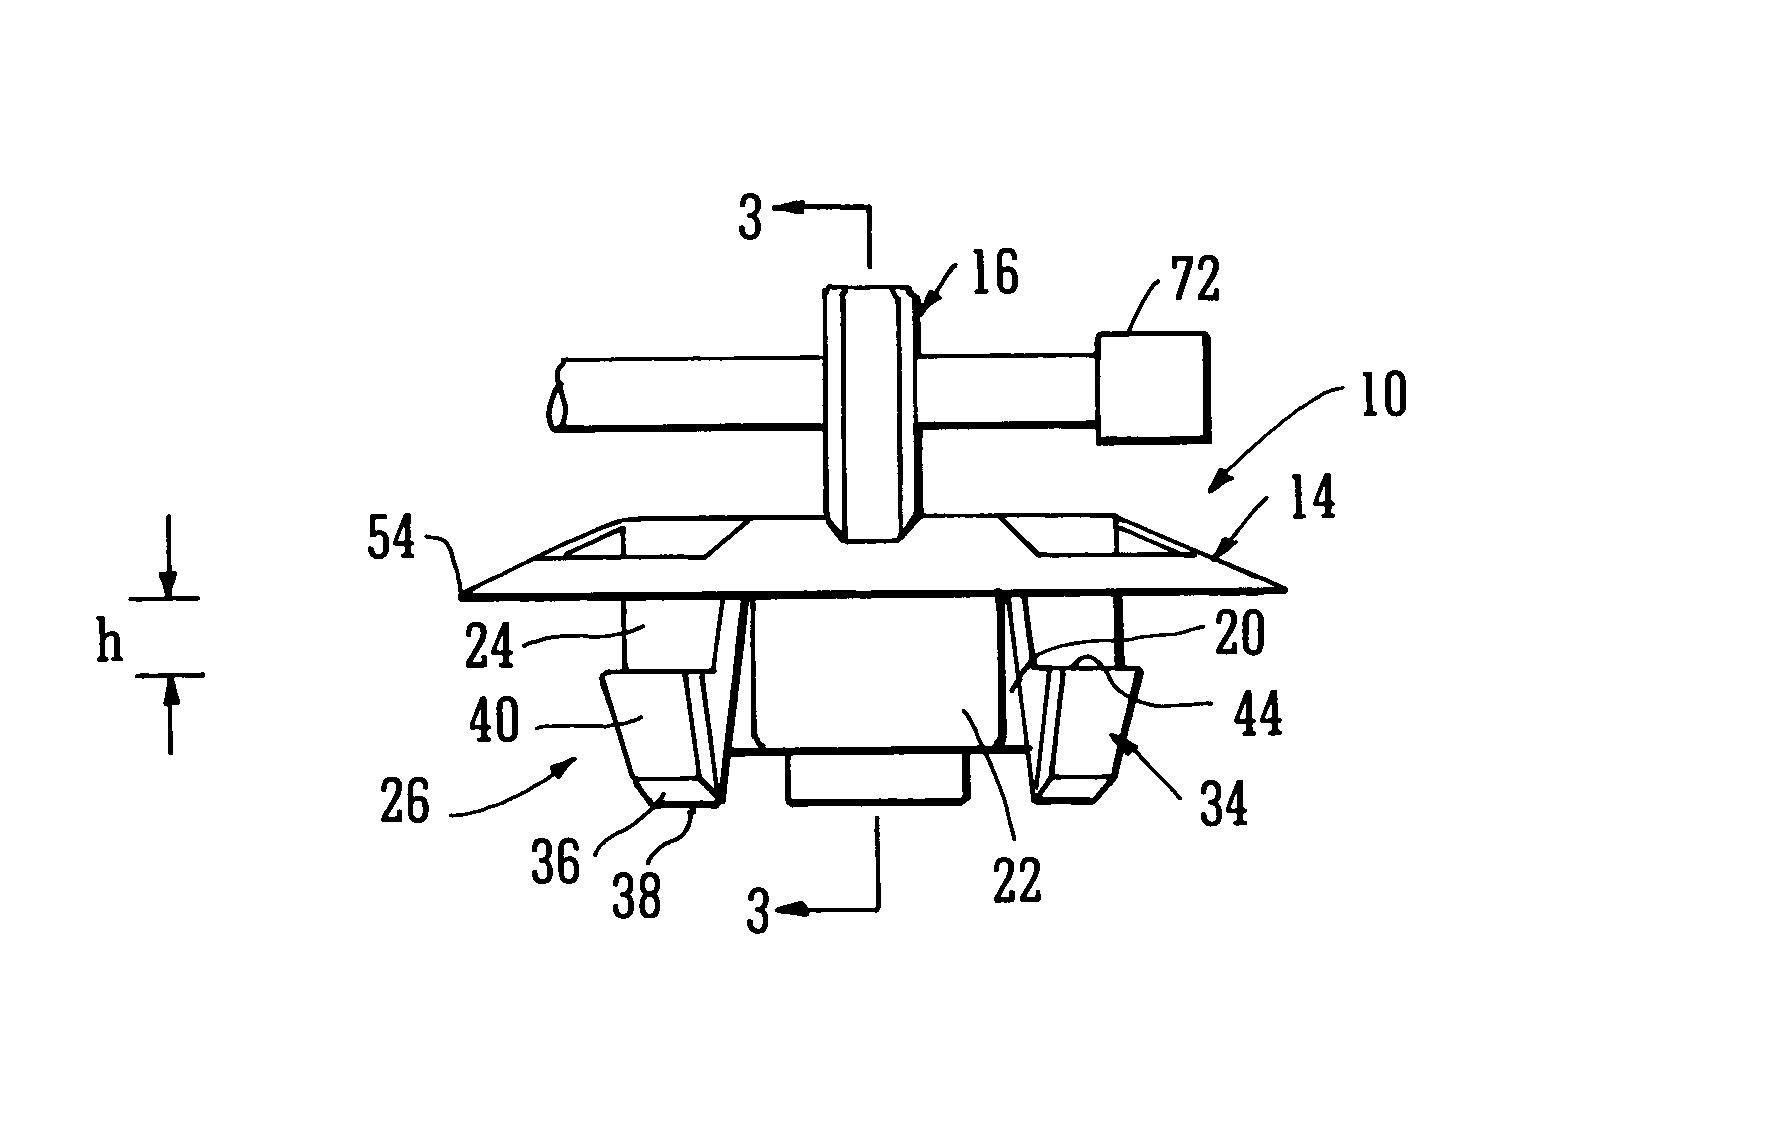 hight resolution of patent us8261409 grommet google patents patent us6660937 grommet for automotive wiring harness google